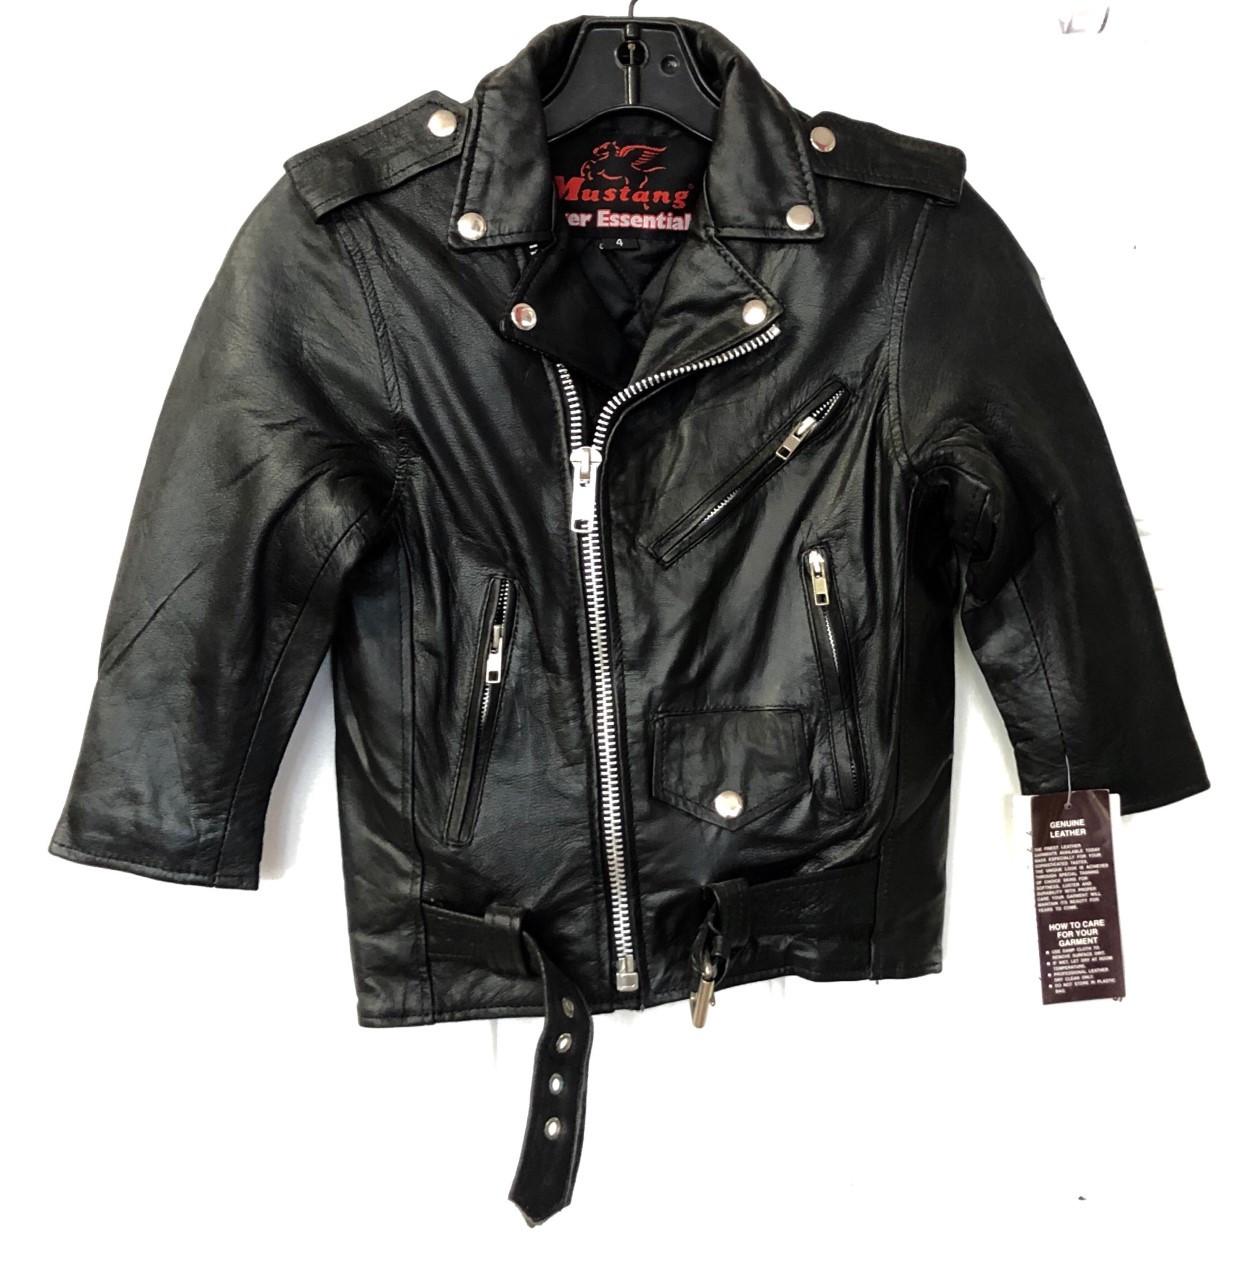 c94929ec8 Kids Leather Motorcycle Jacket | Kingman AZ Route 66 Motorcycle Shop